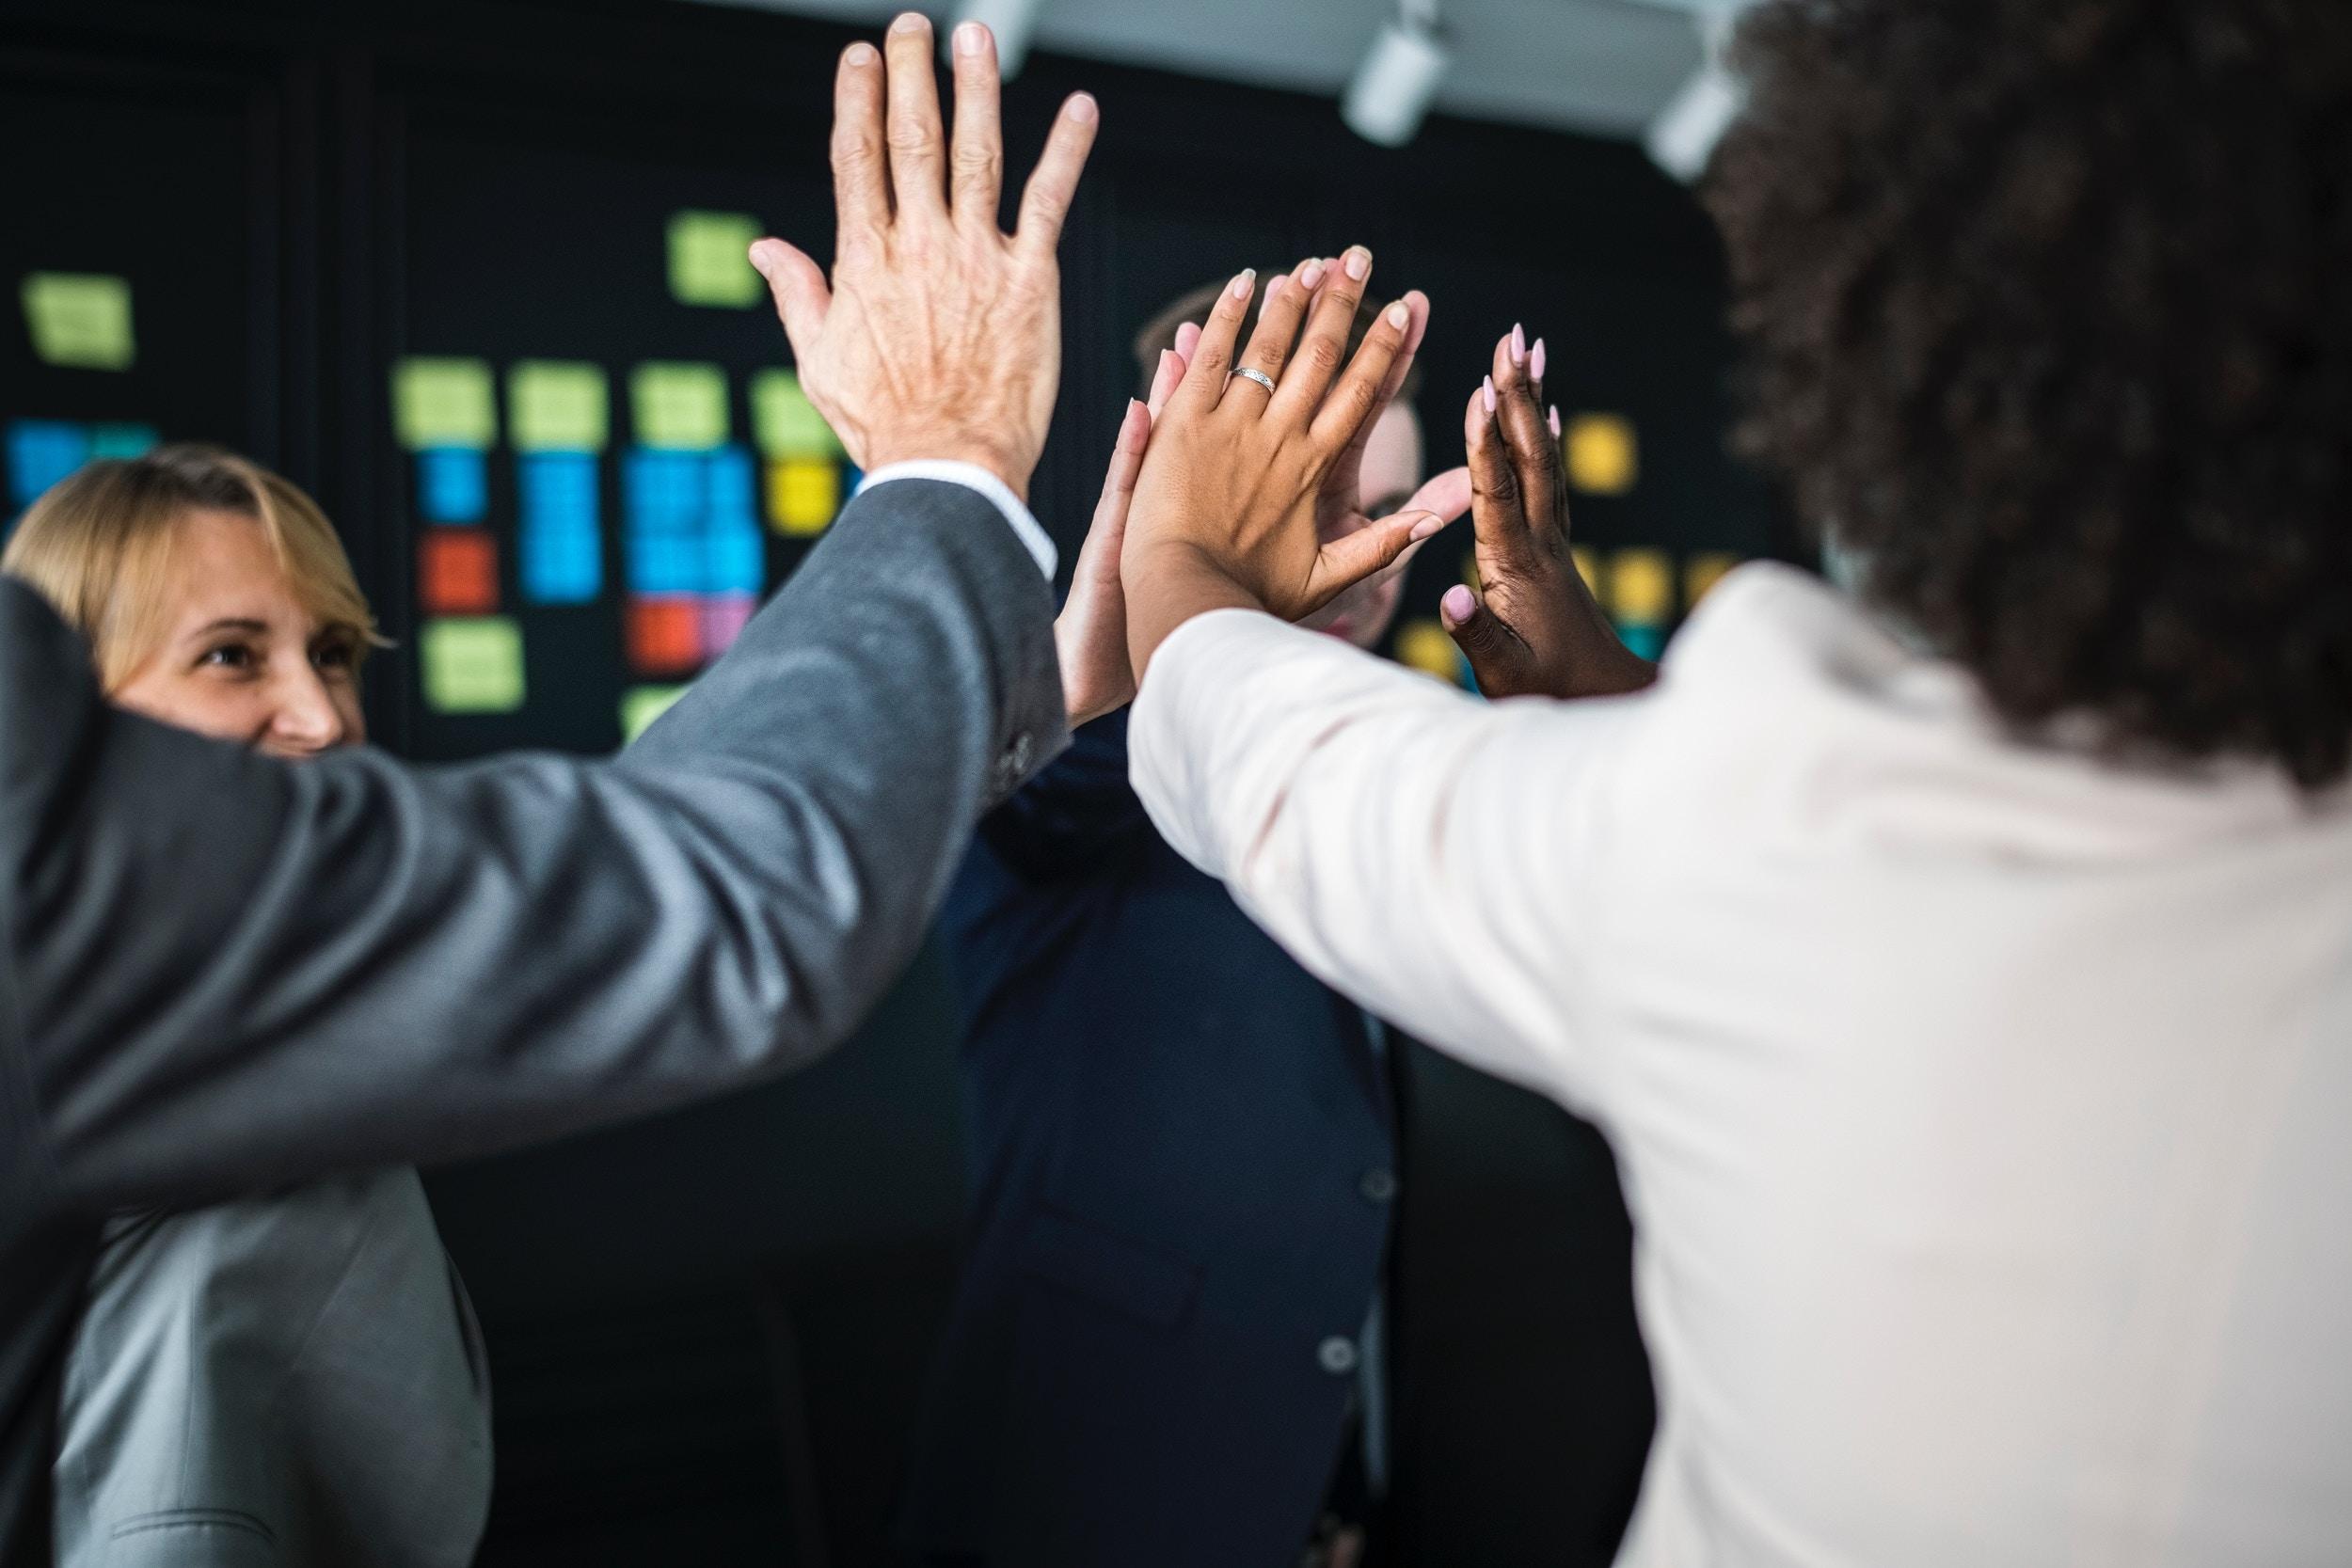 Employee Retention – Methods to Retain Employees